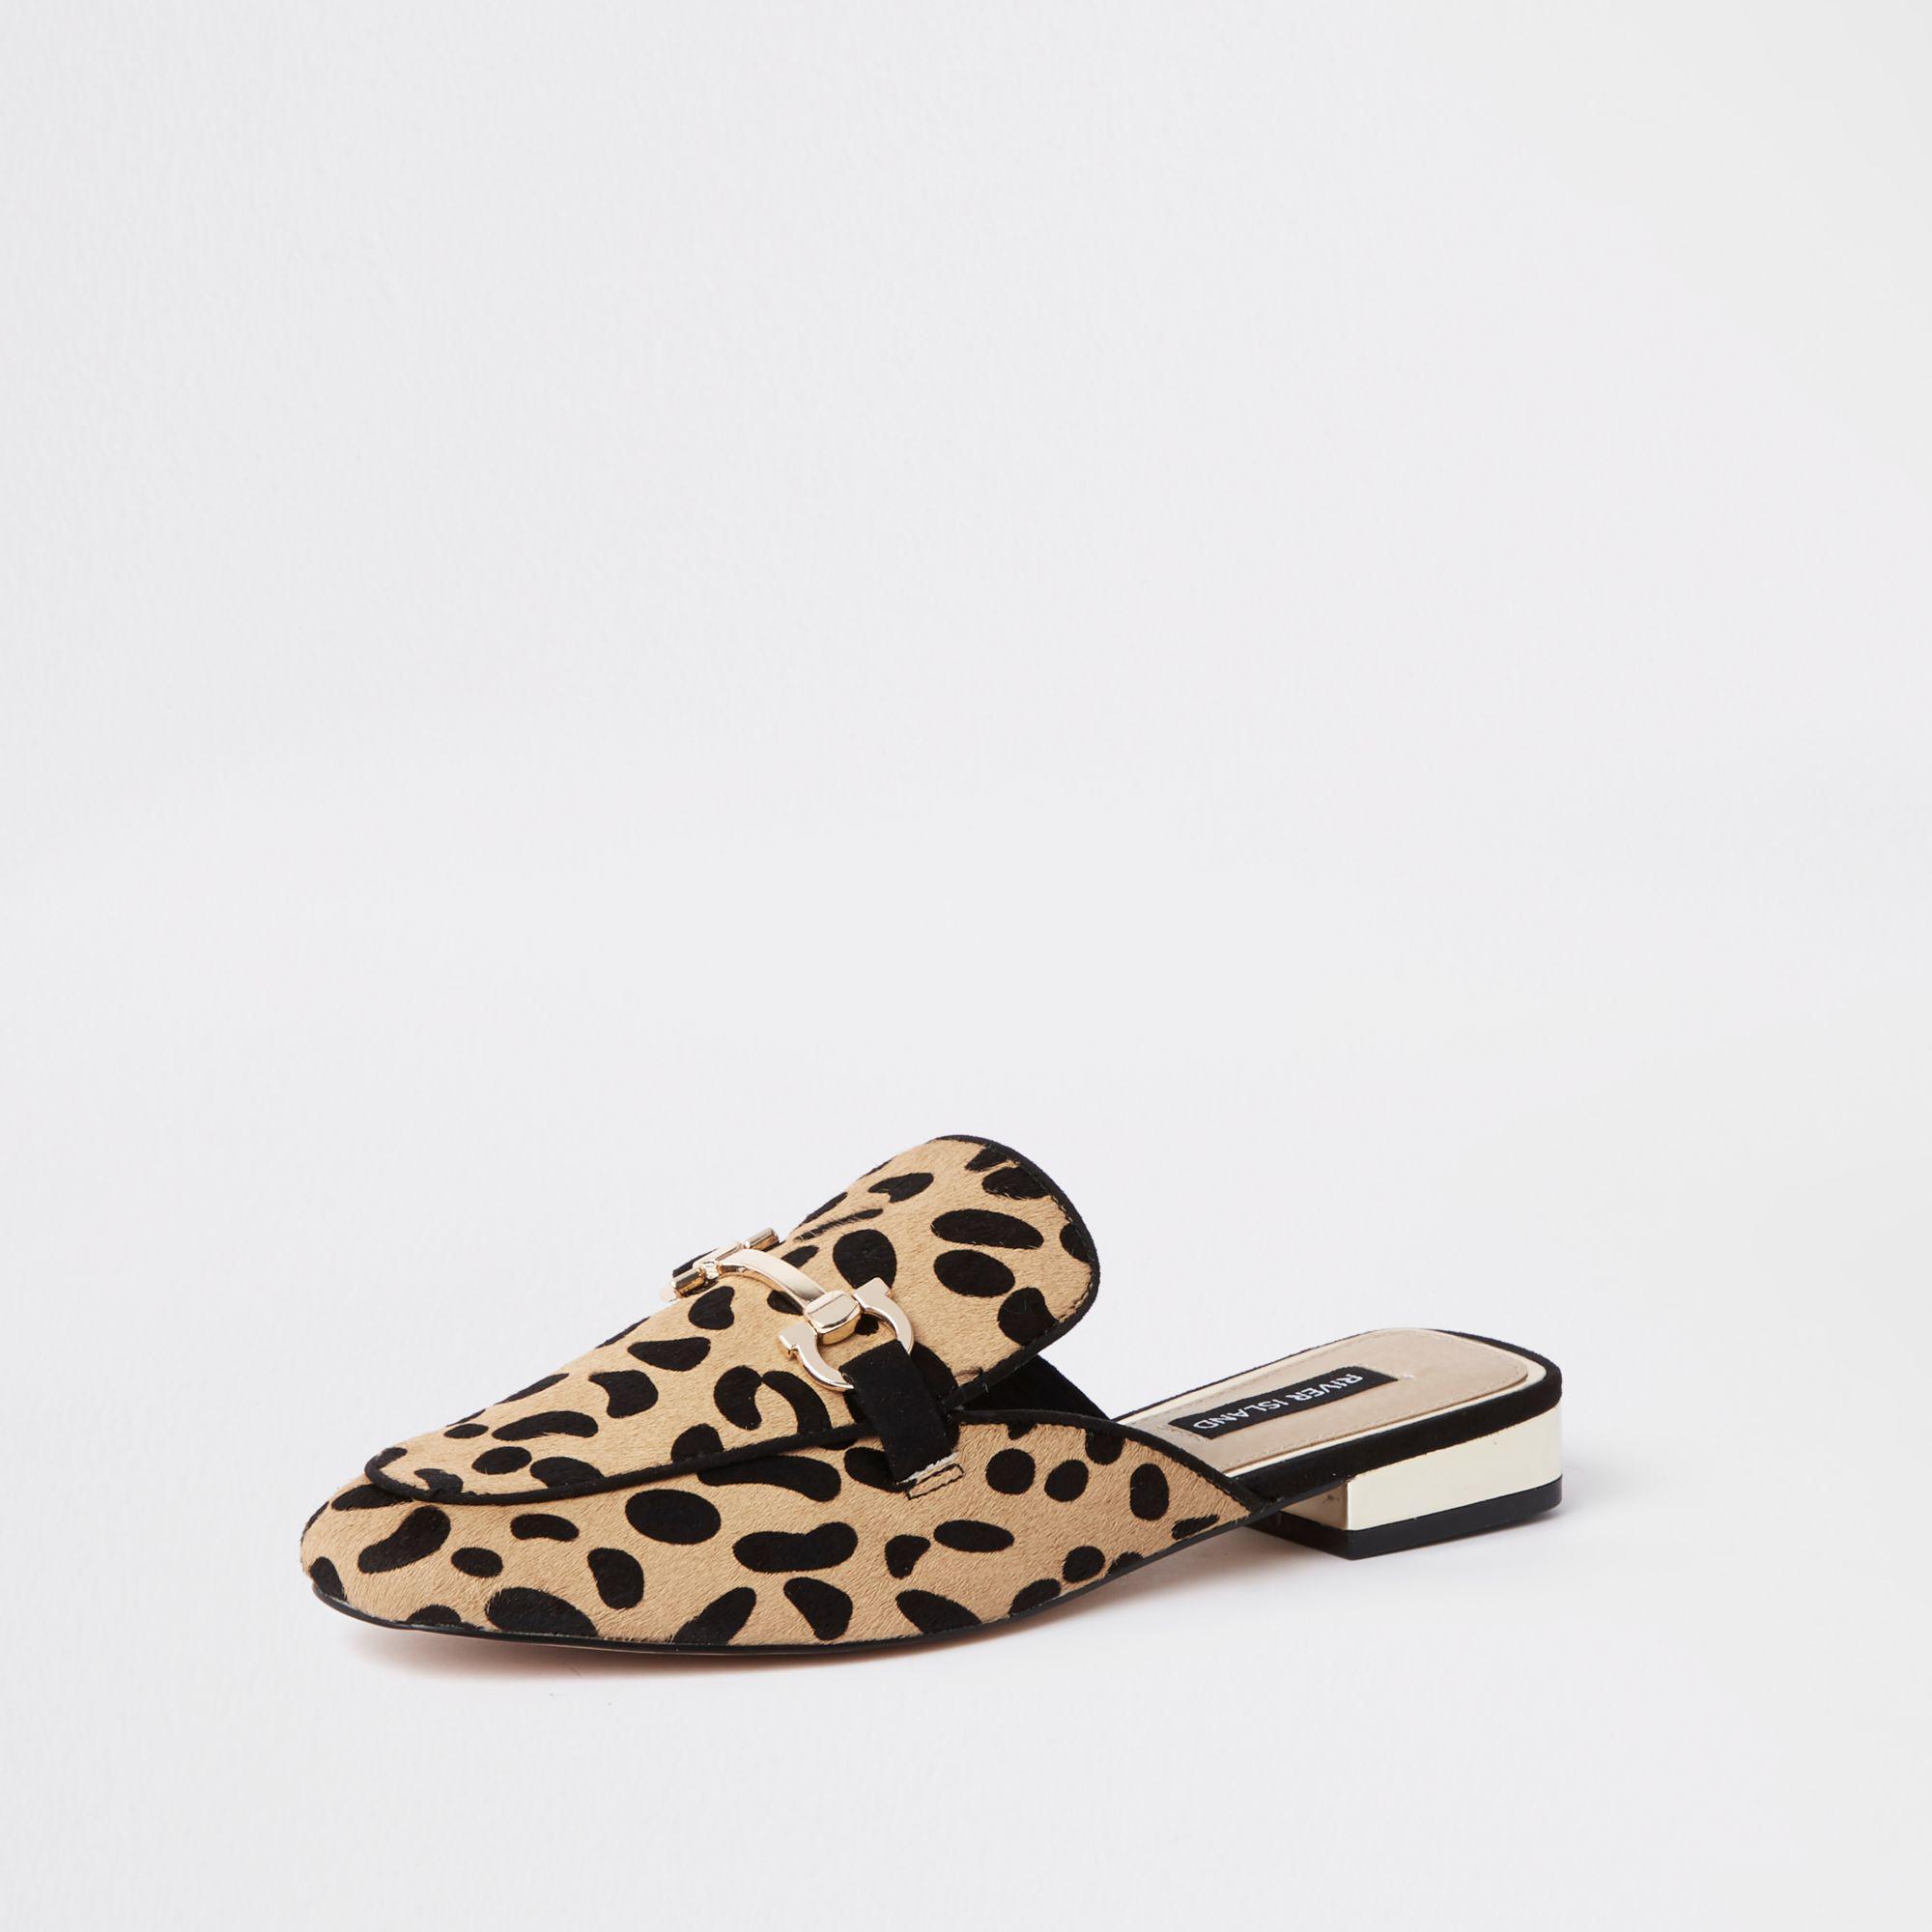 9963fc6dbfa River Island - Brown Leopard Snaffle Backless Loafers - Lyst. View  fullscreen